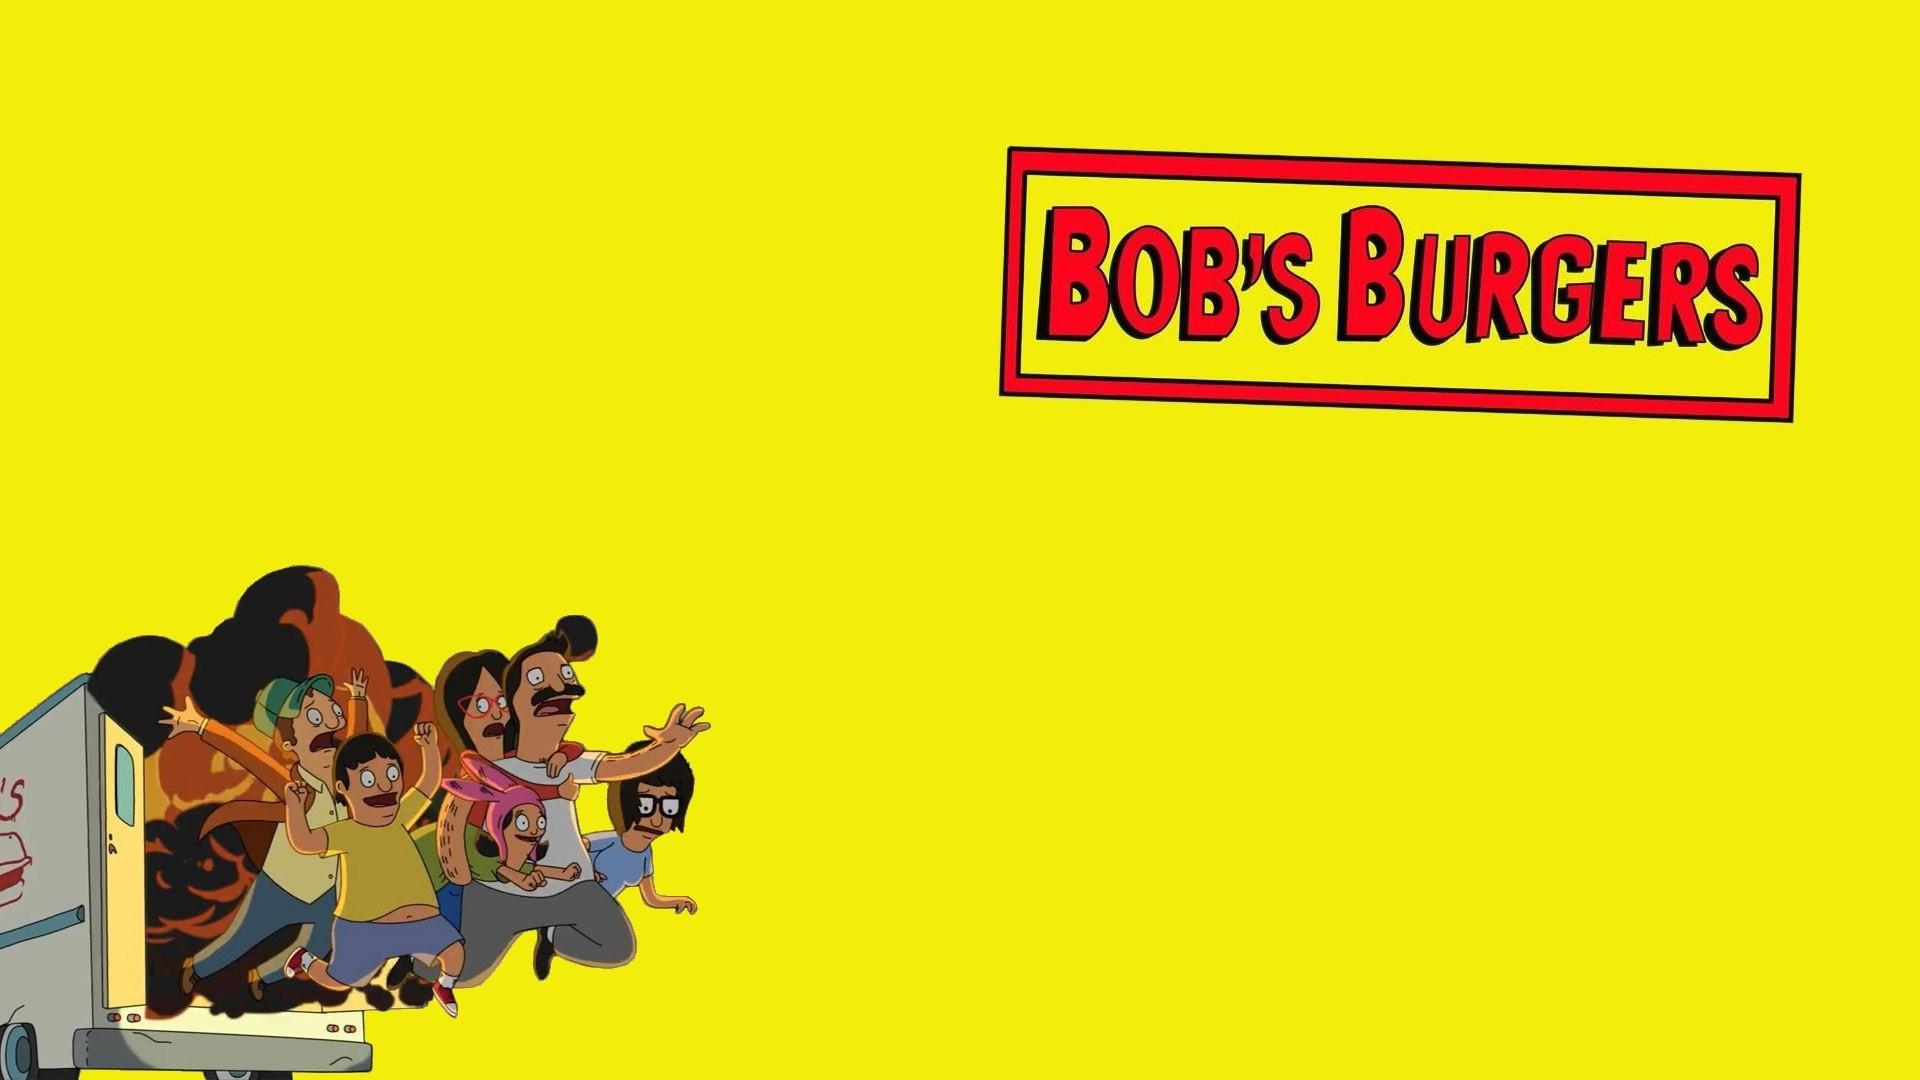 Funny Bobs Burgers Wallpaper (81+ images)